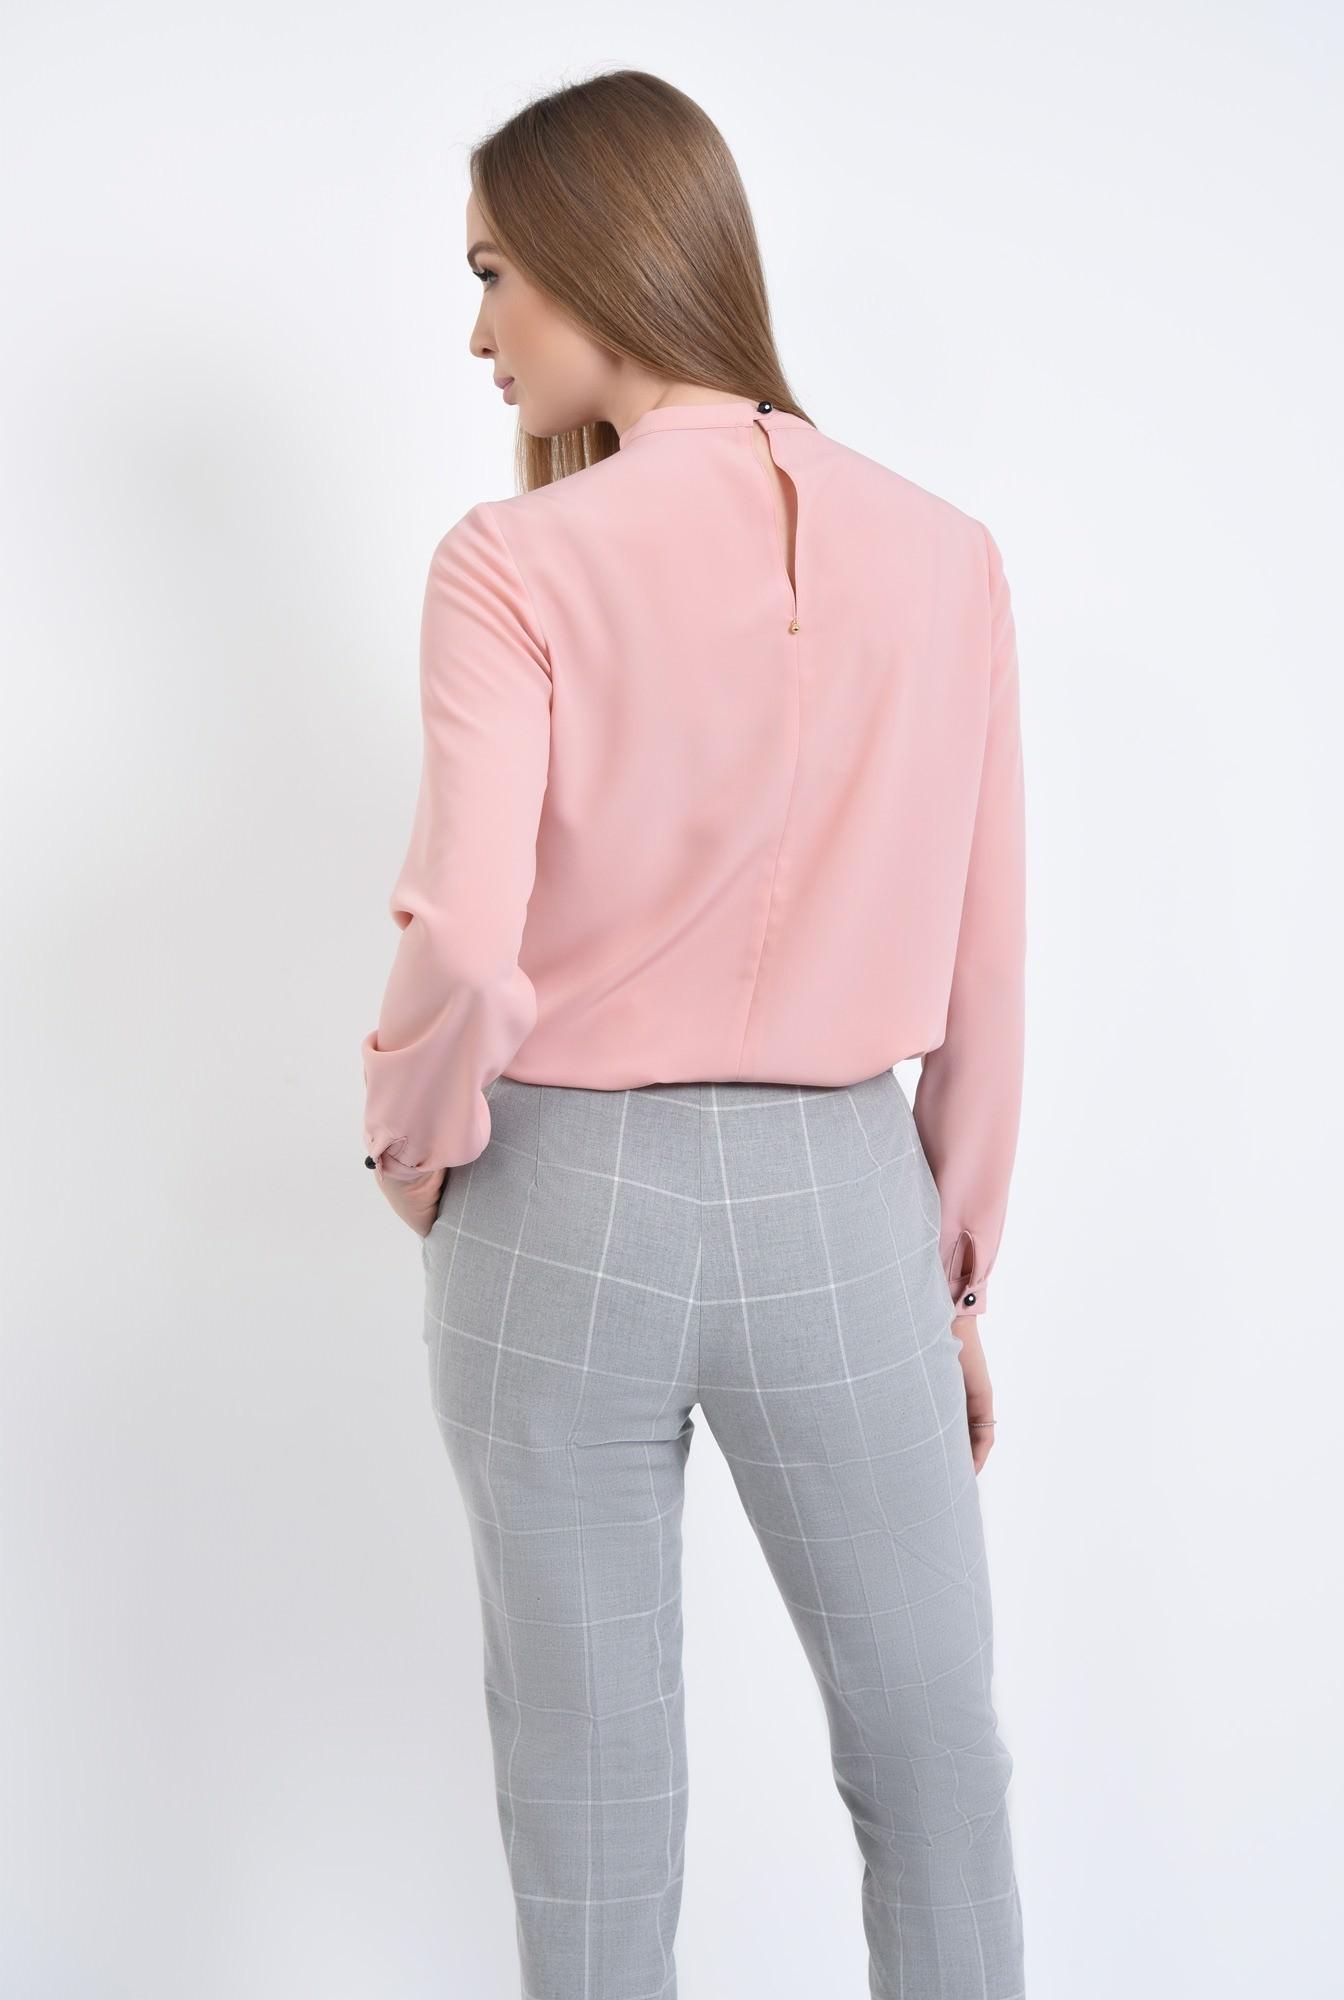 1 - bluza roz, maneci bufante, cu mansete